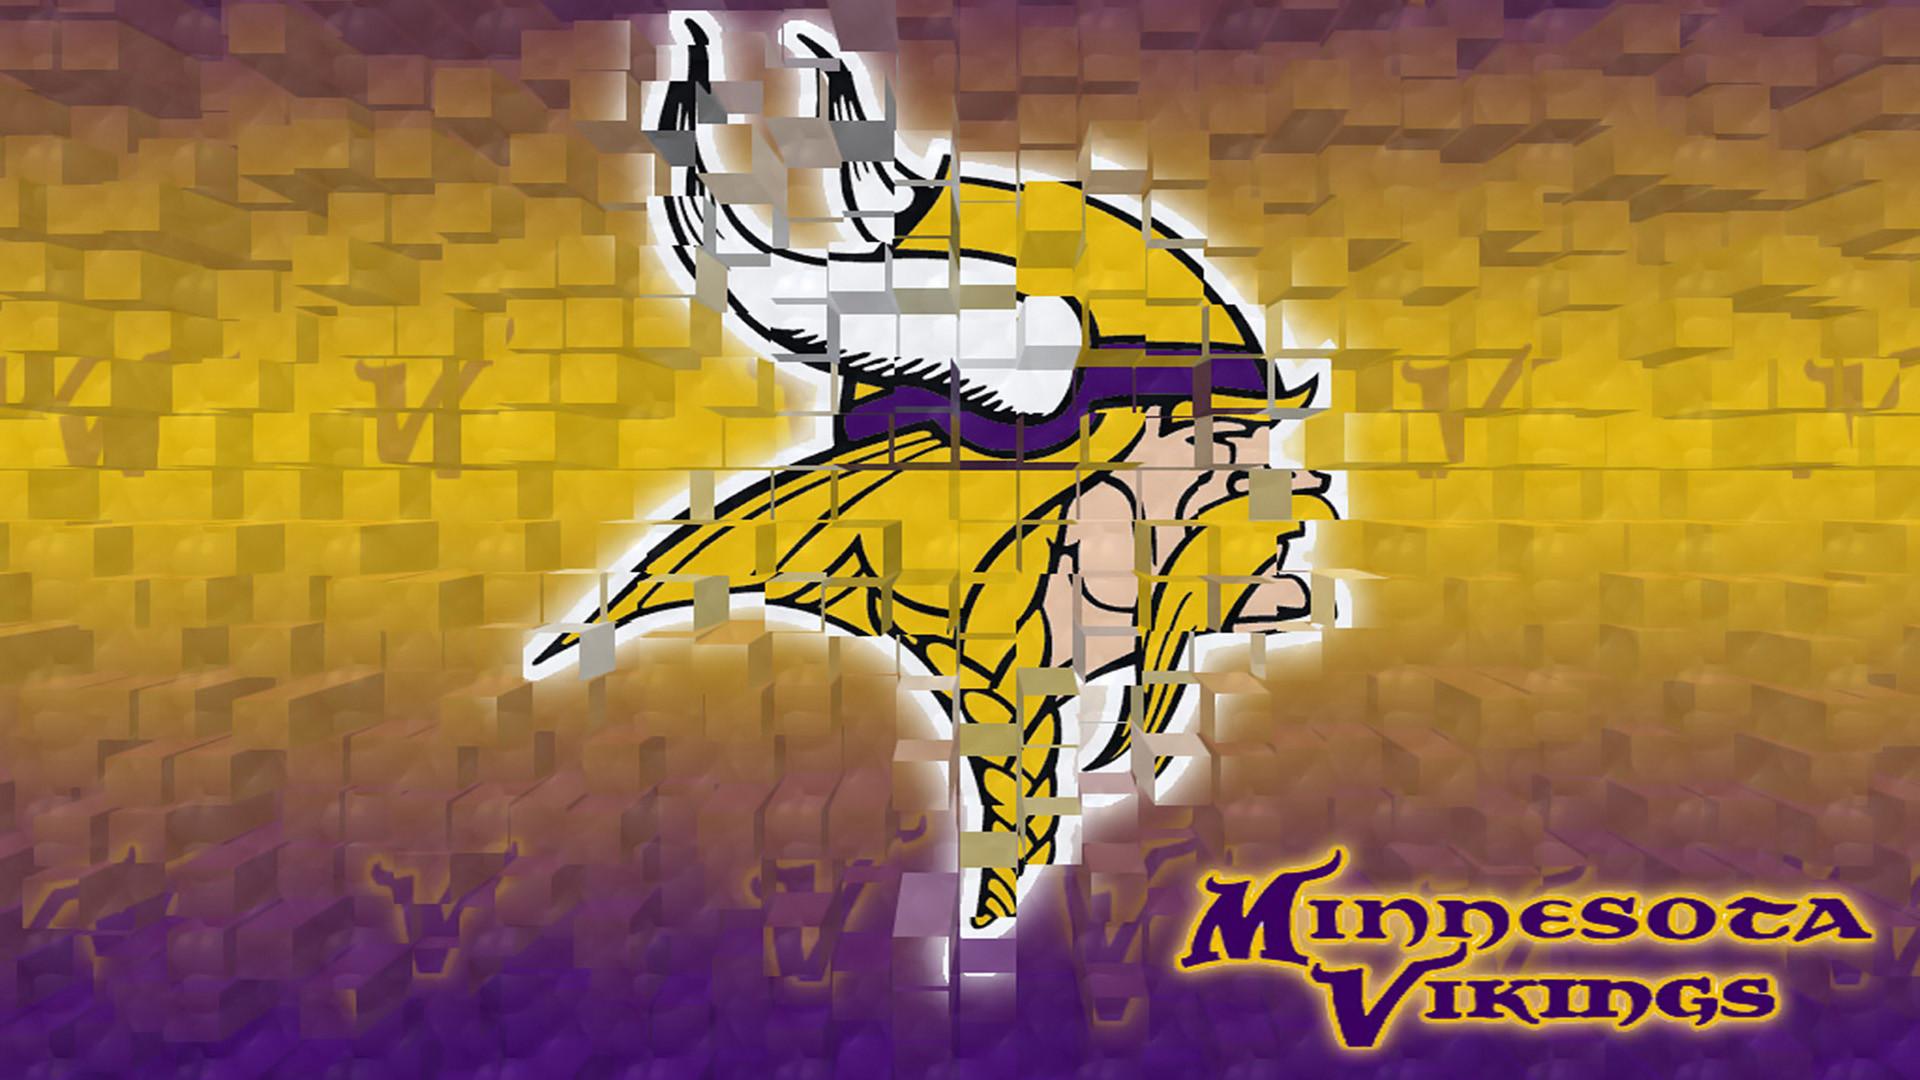 Houston Texans Iphone Wallpaper Vikings Logo Wallpaper 70 Images